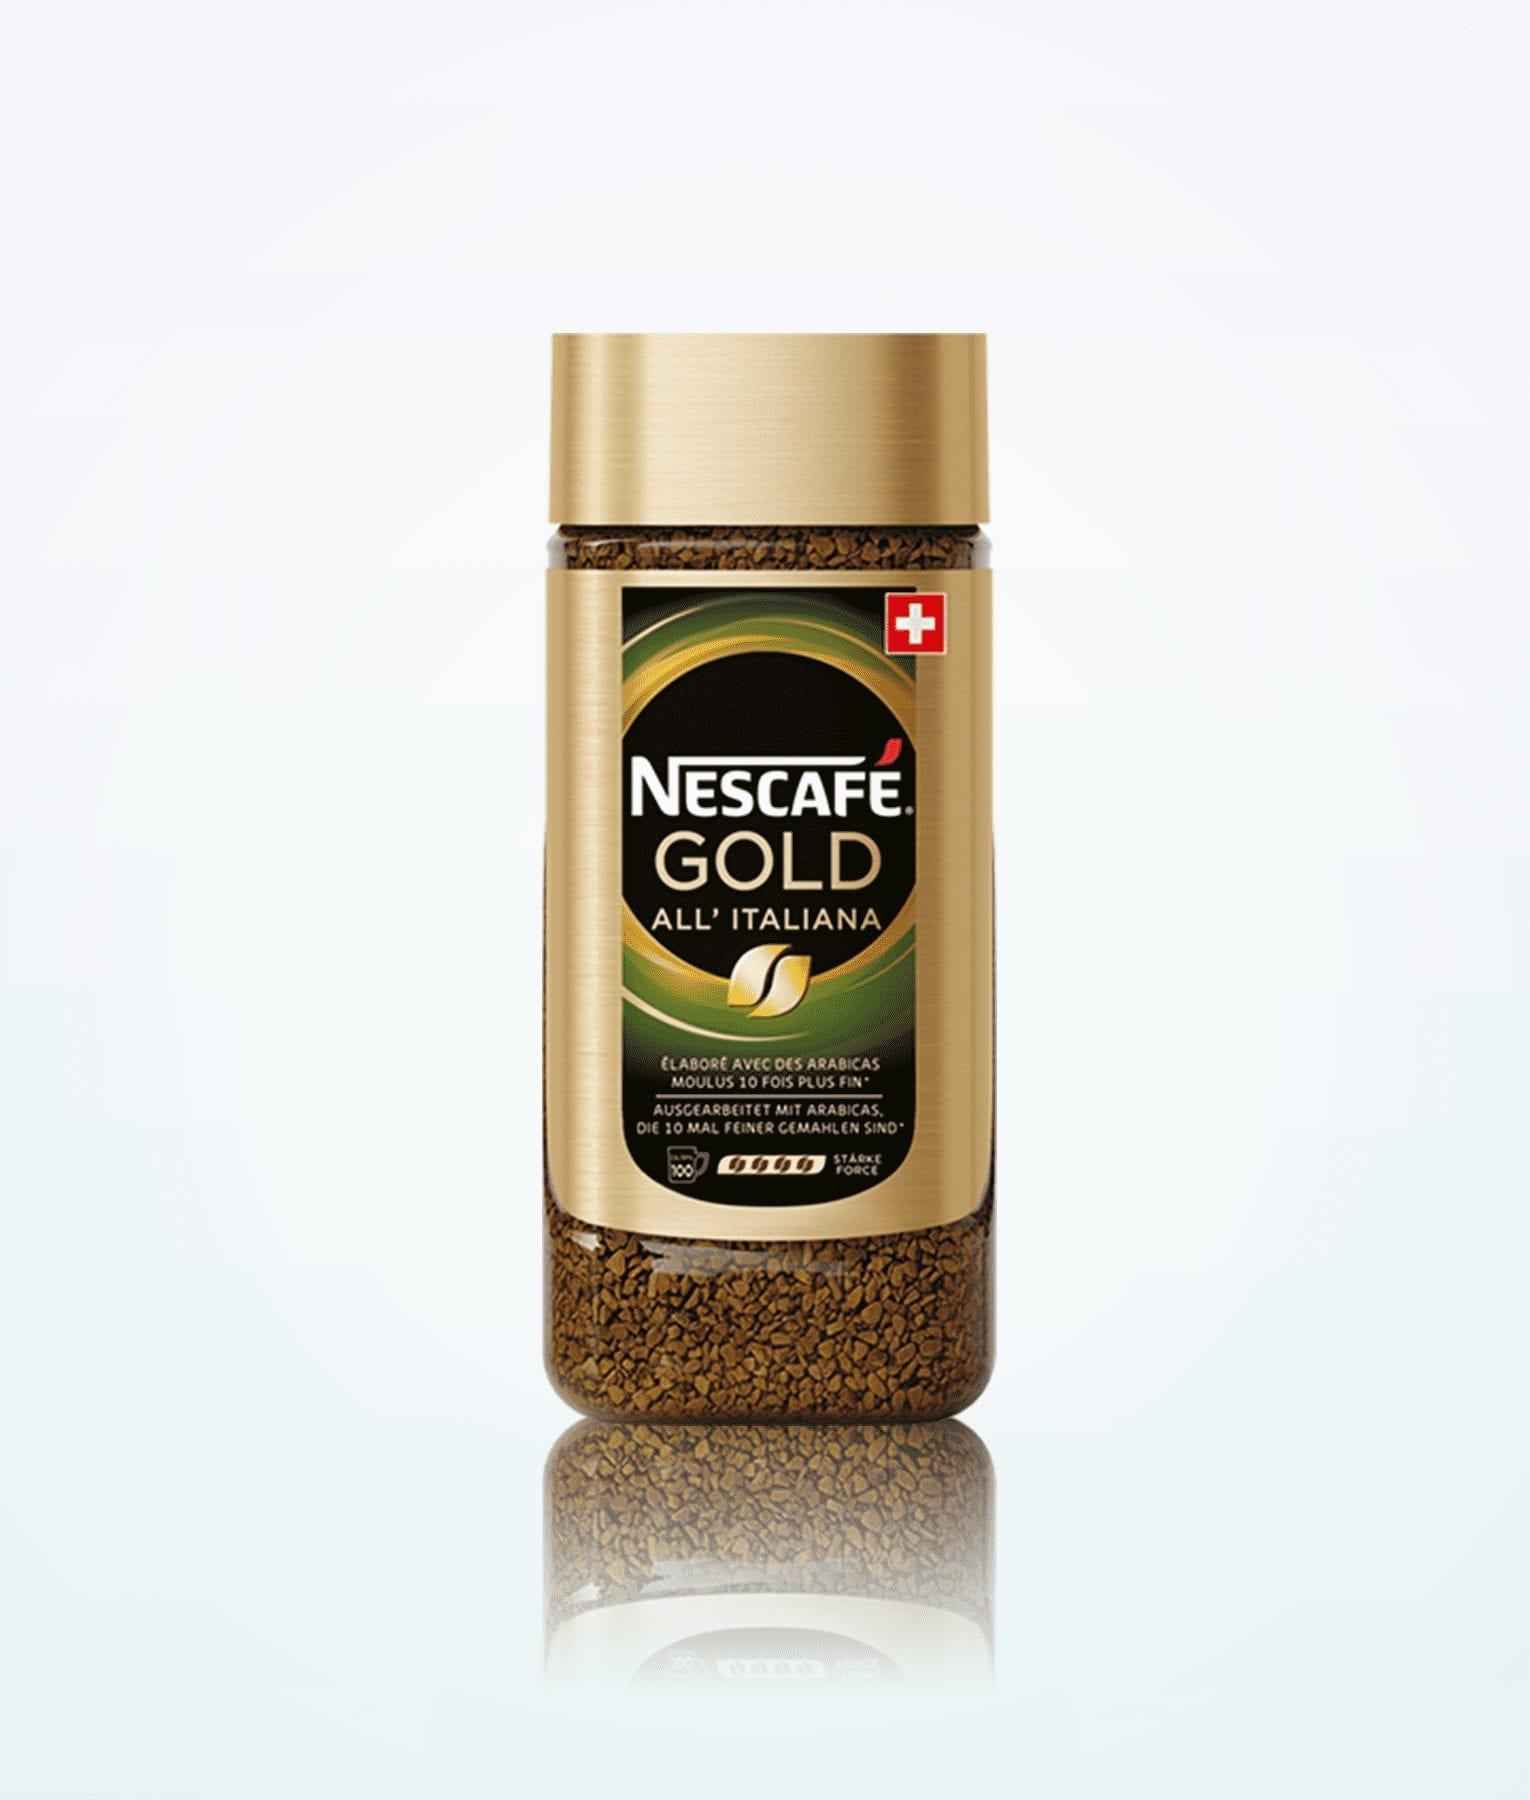 nescafe-gold-instant-coffee-all-italiana-200g